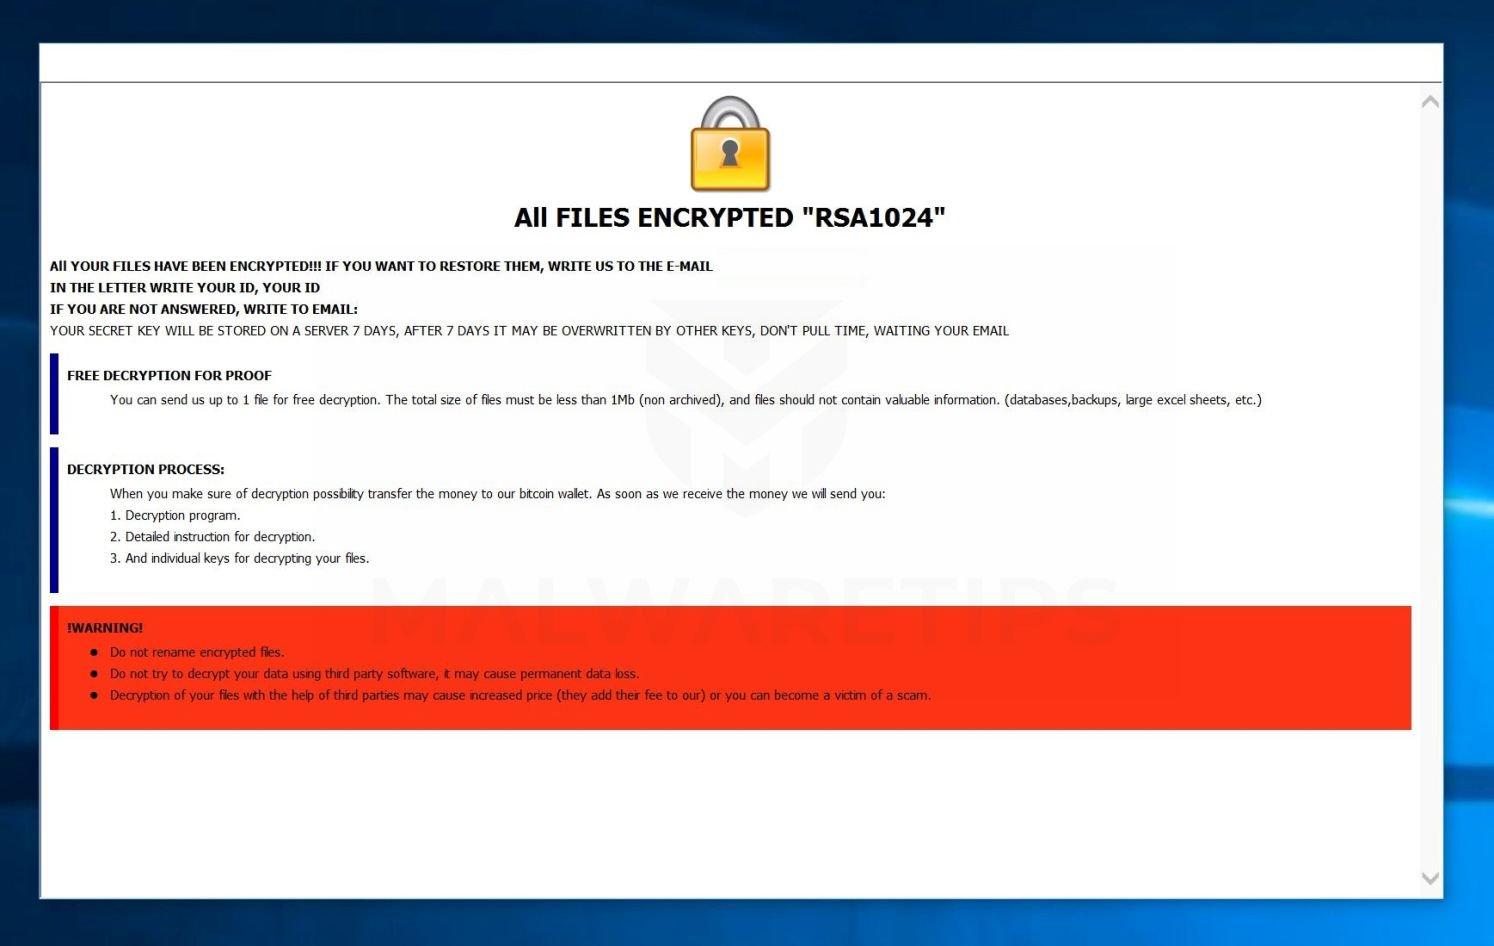 Image: [Decryptoperator@qq.com].Cry ransomware